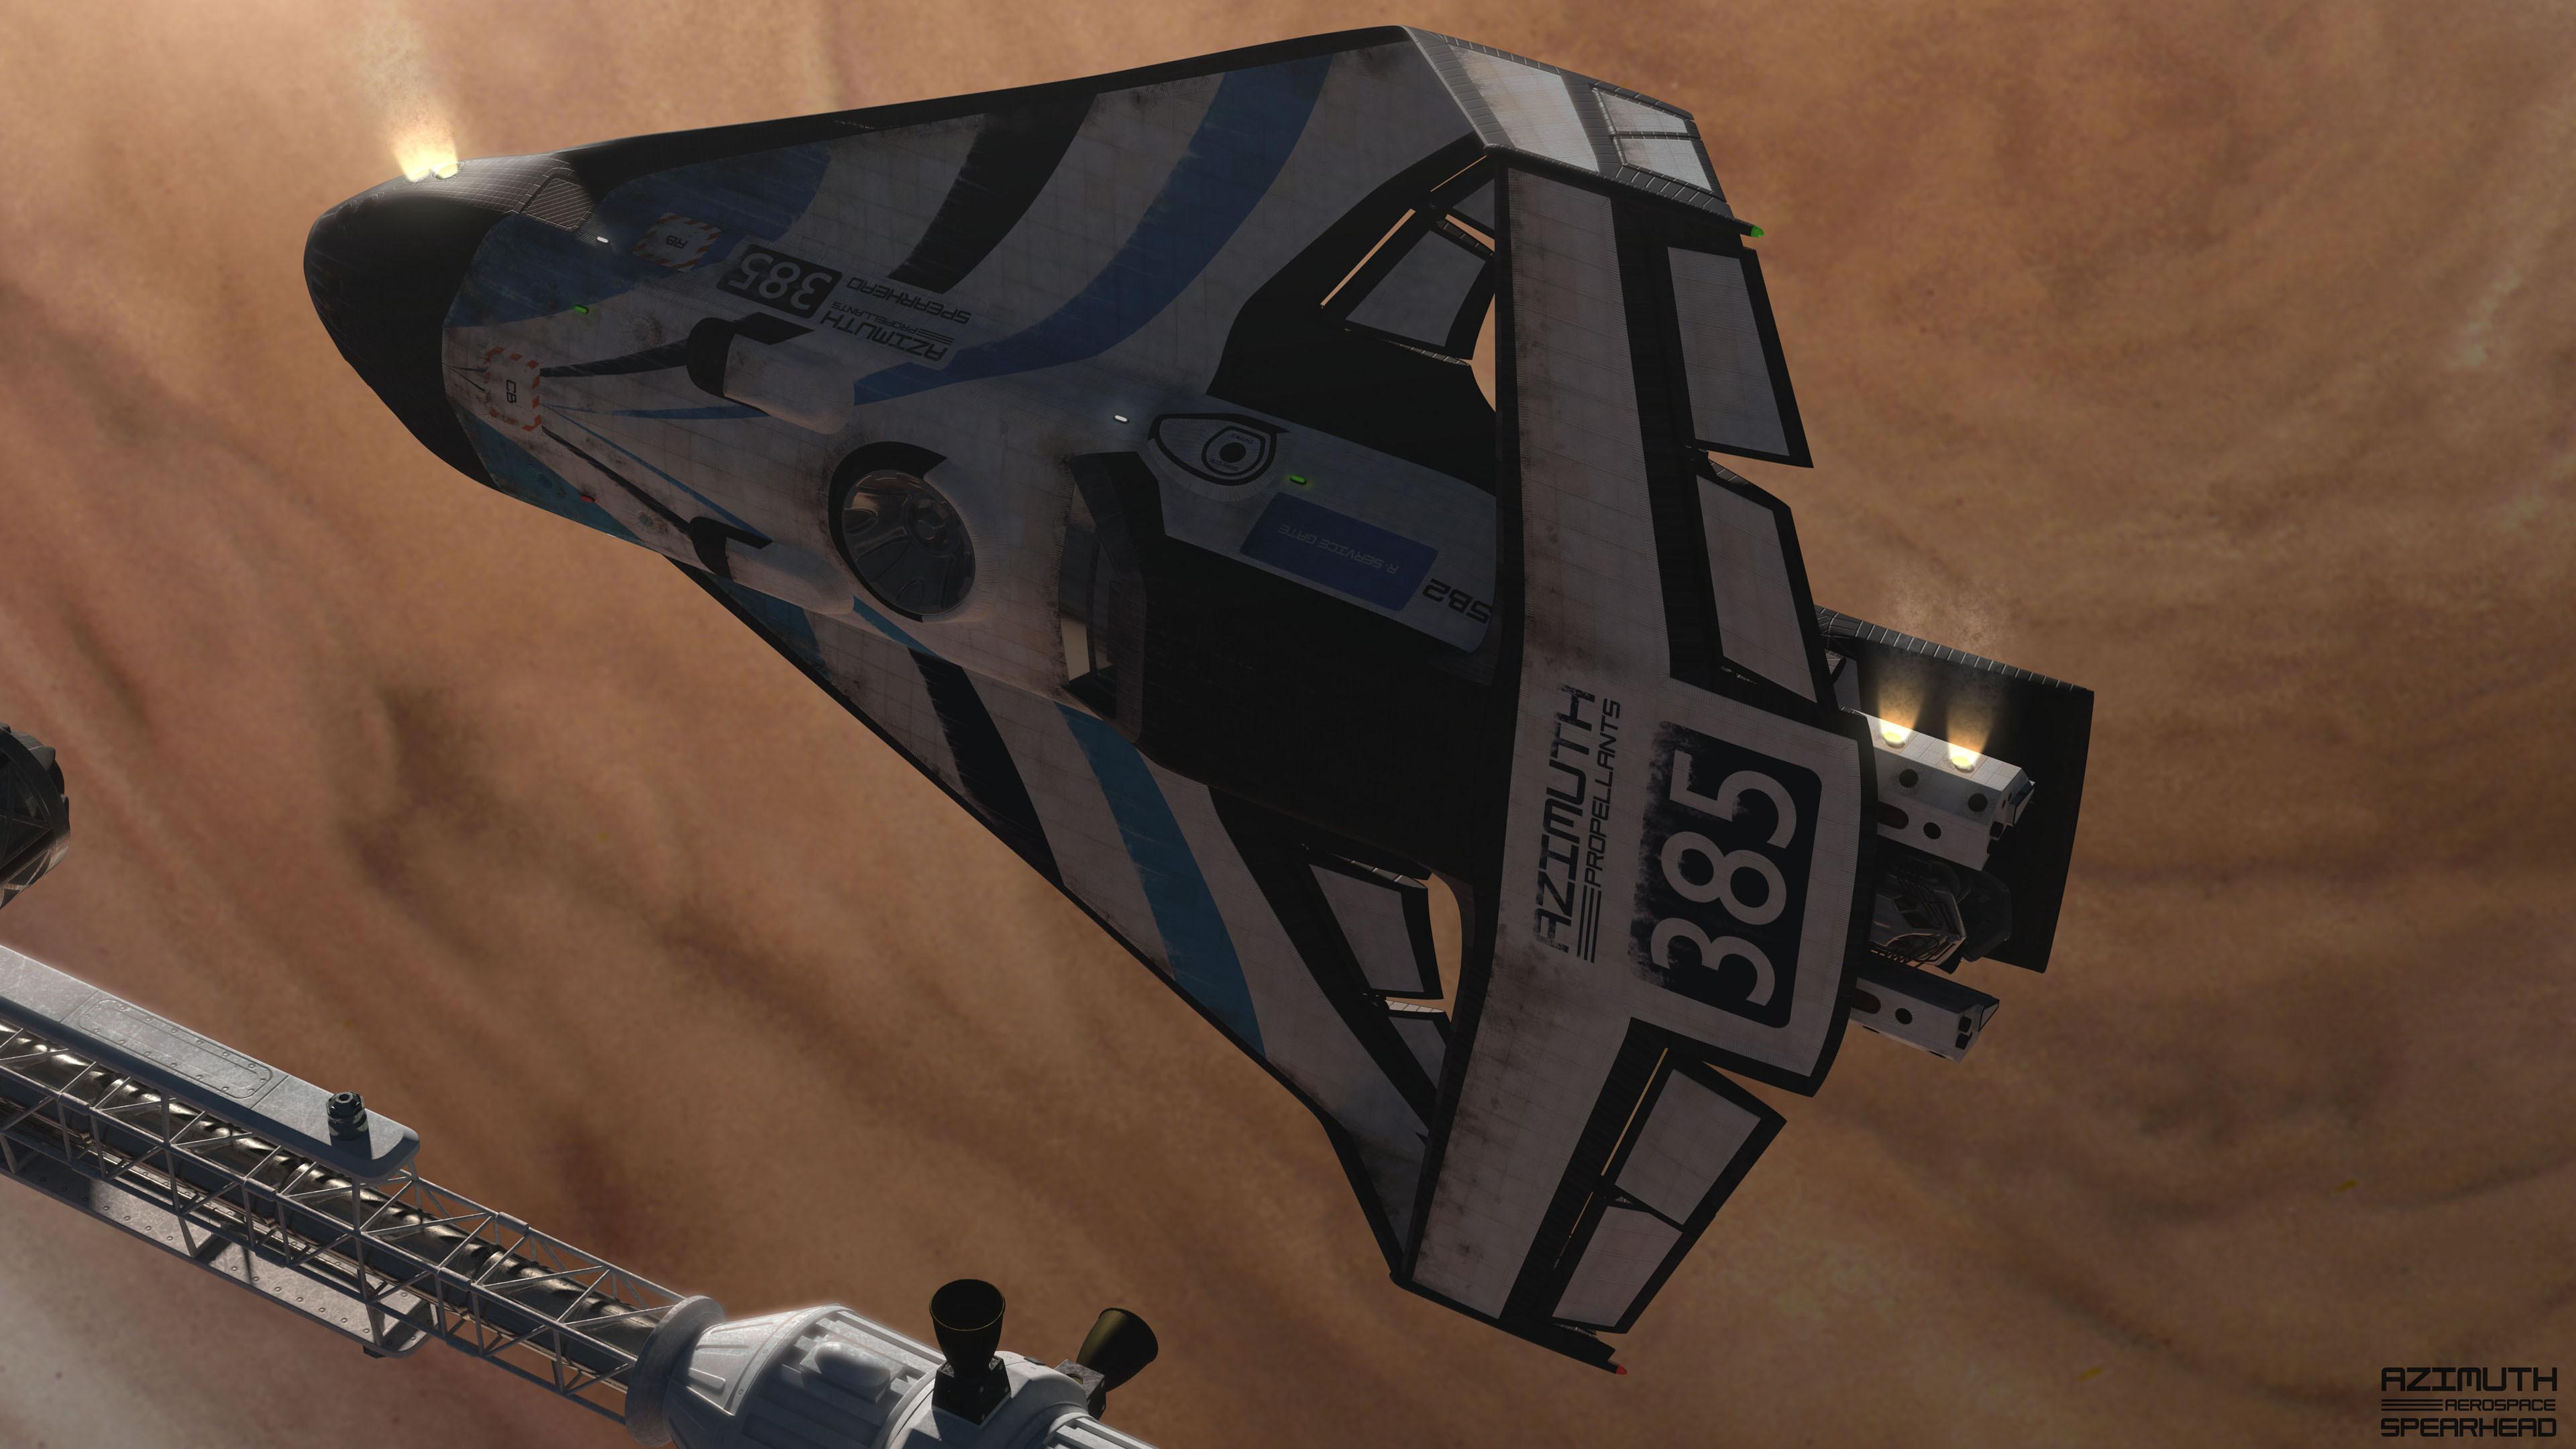 Undocking from an interplanetary vehicle